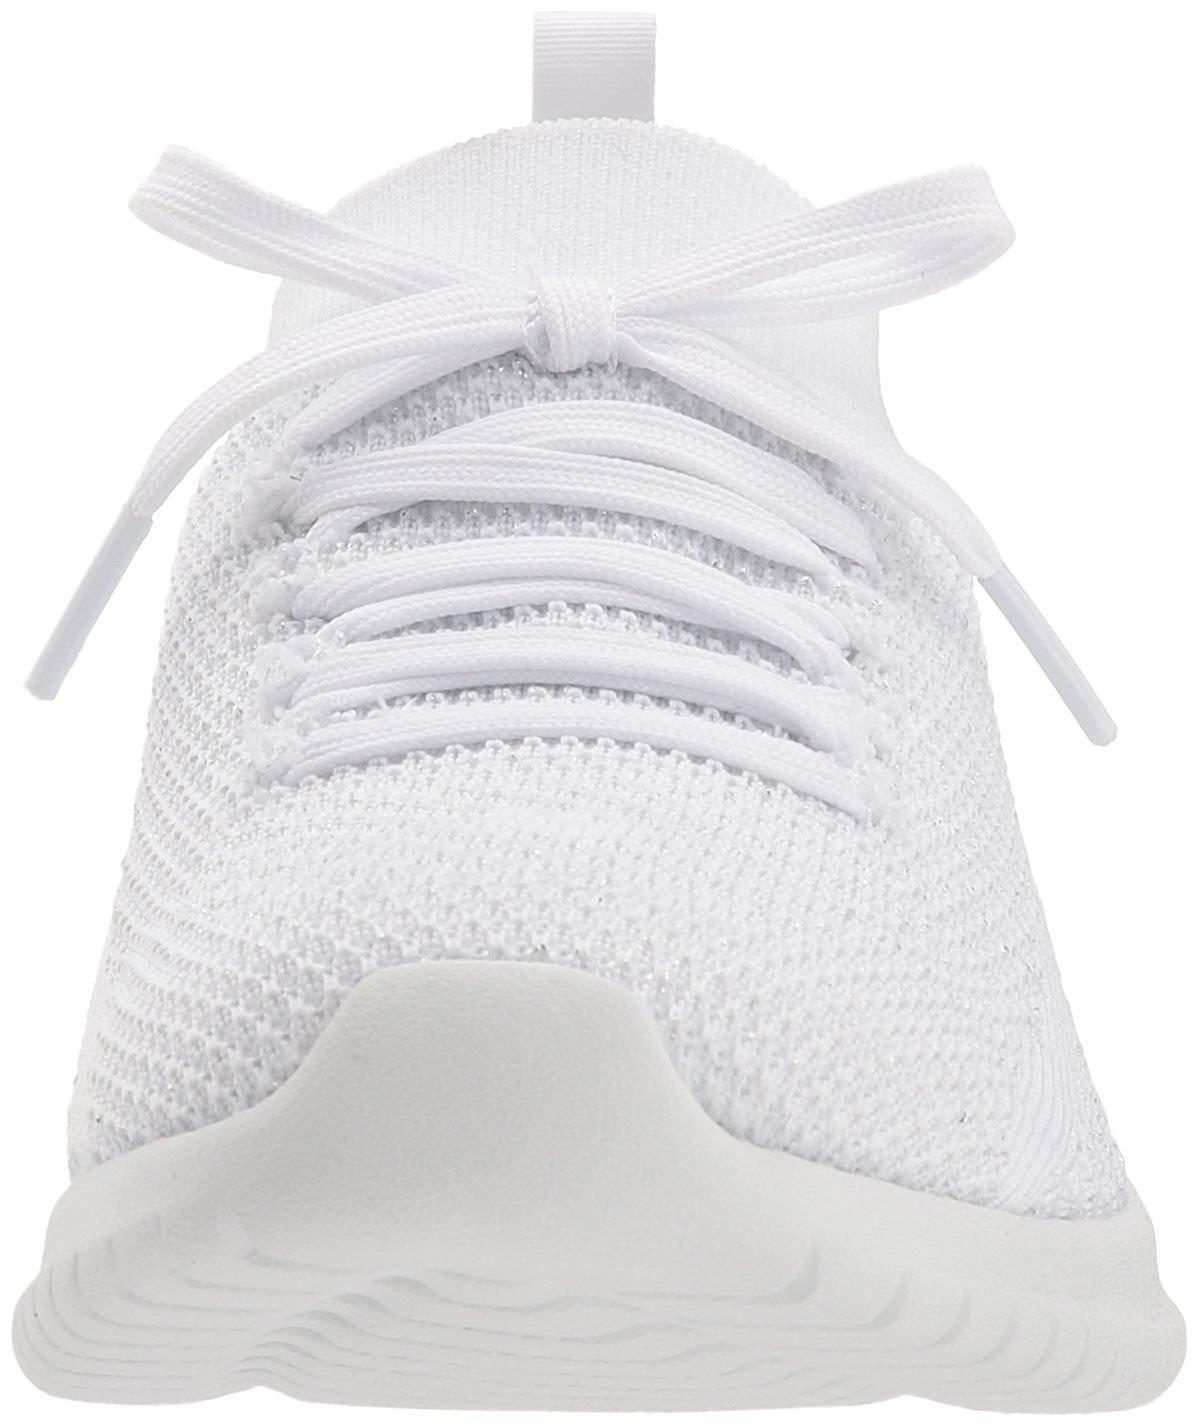 Skechers Women's Ultra Flex Salutations Sneaker White